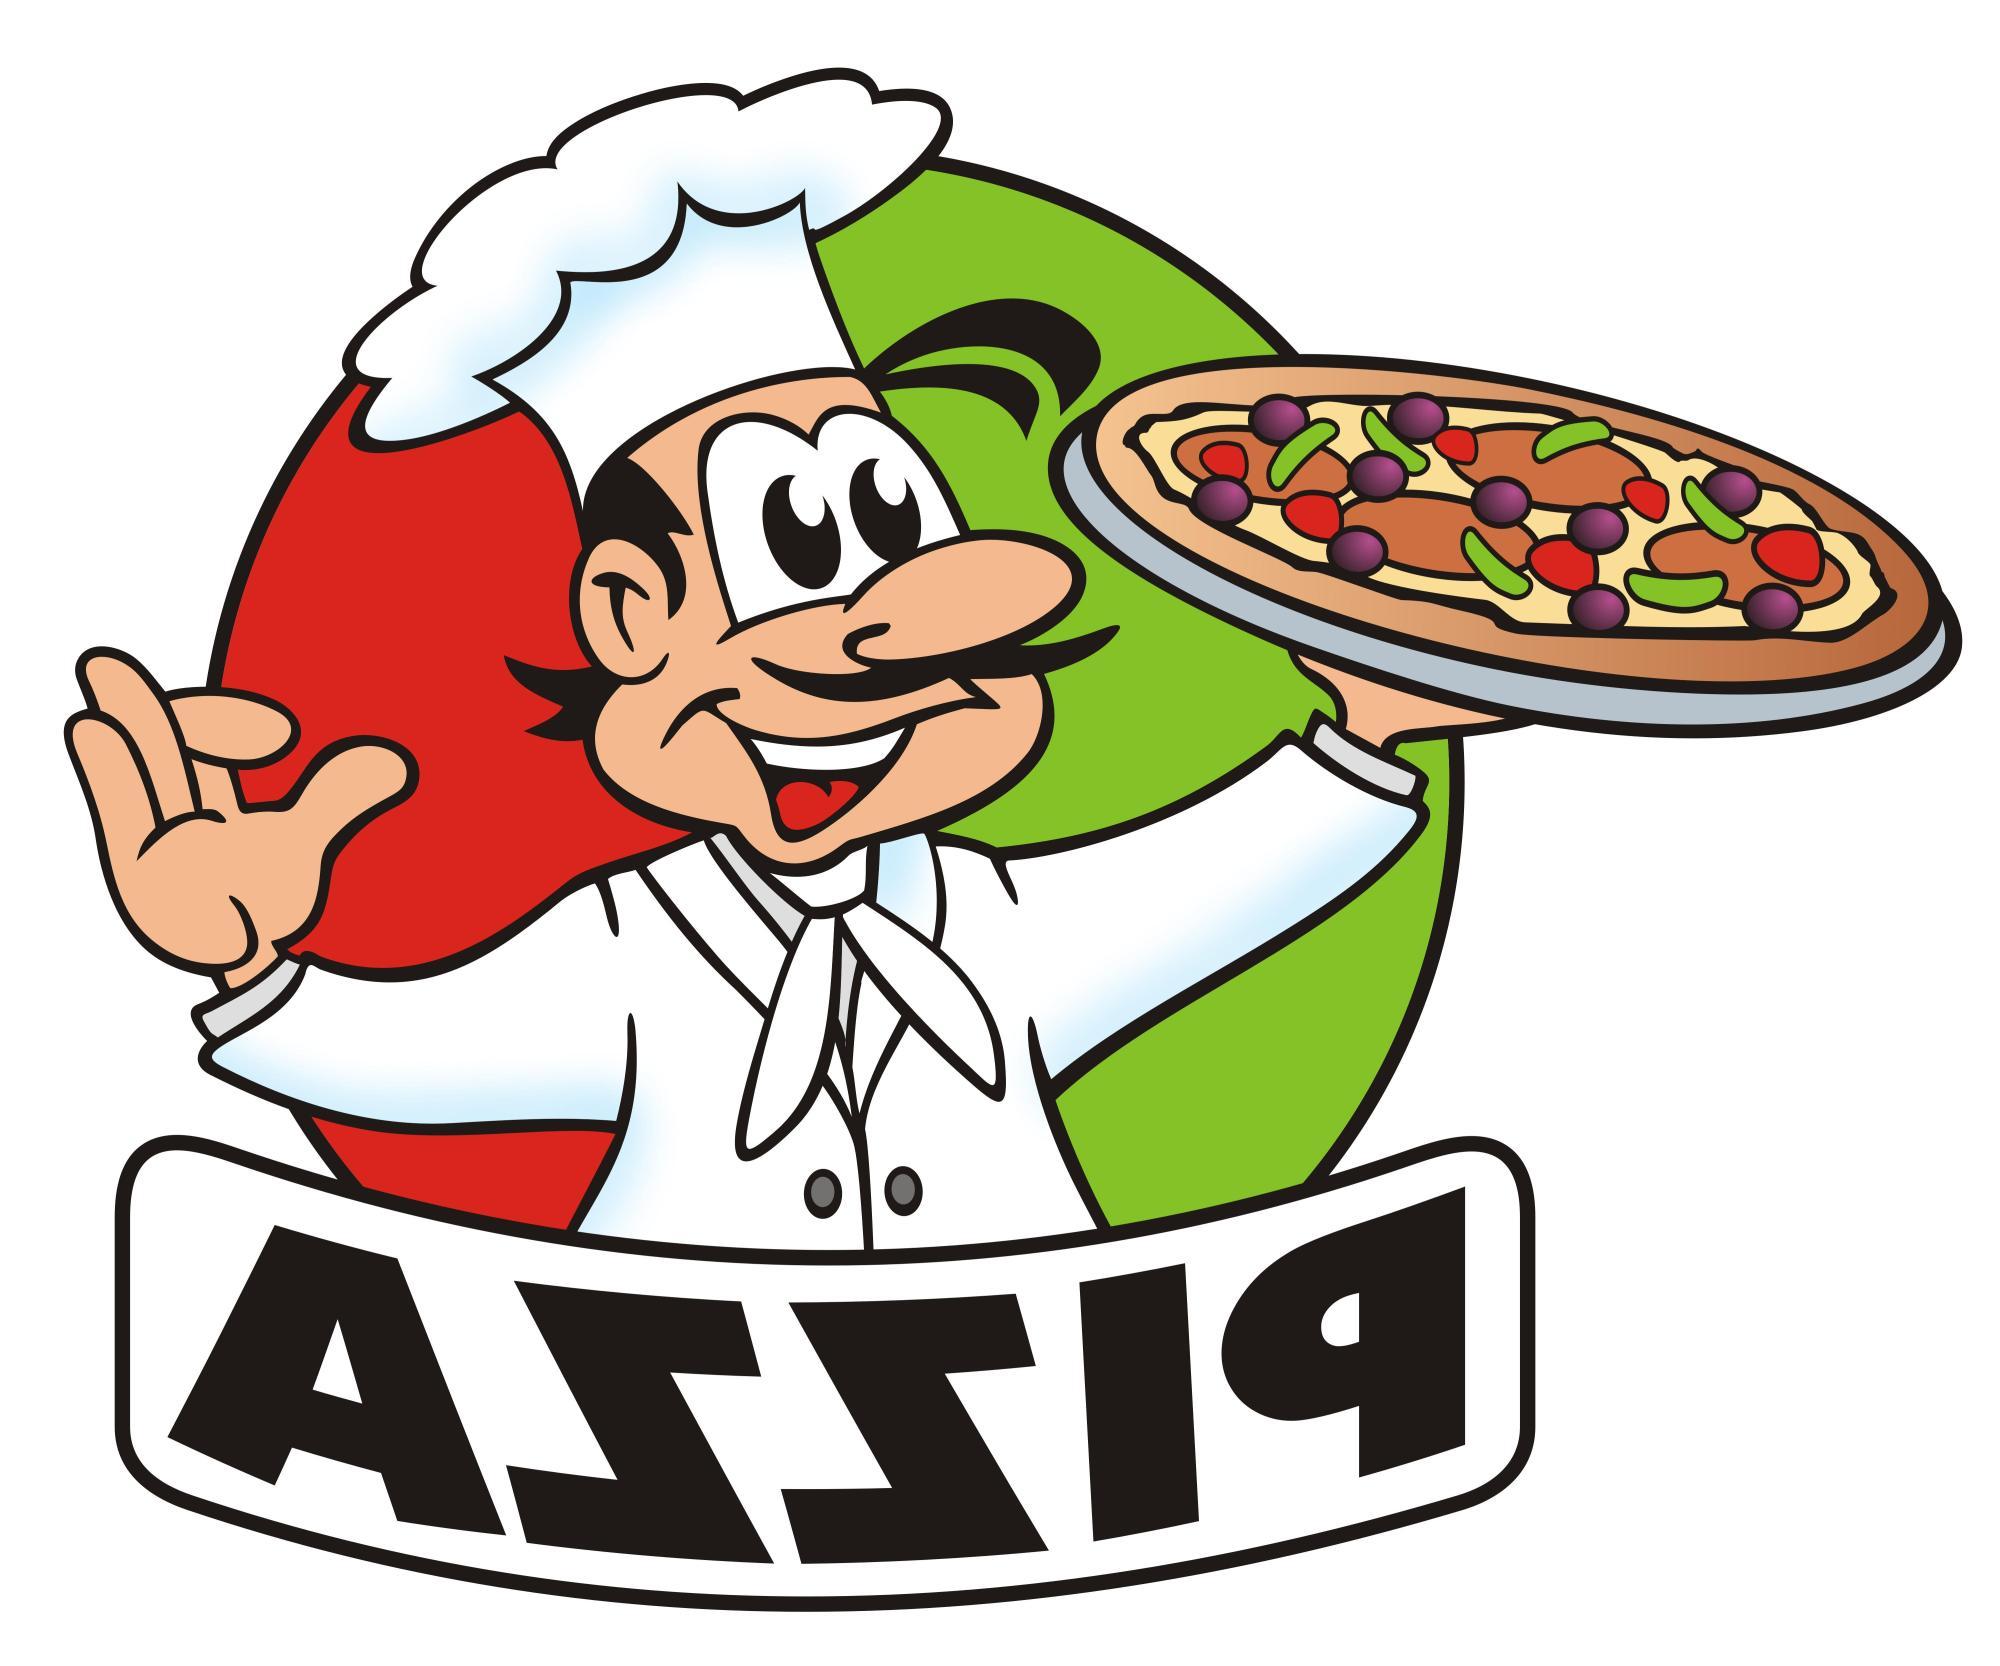 hight resolution of 6000x5000 unique italian chef clipart cartoon pizza image